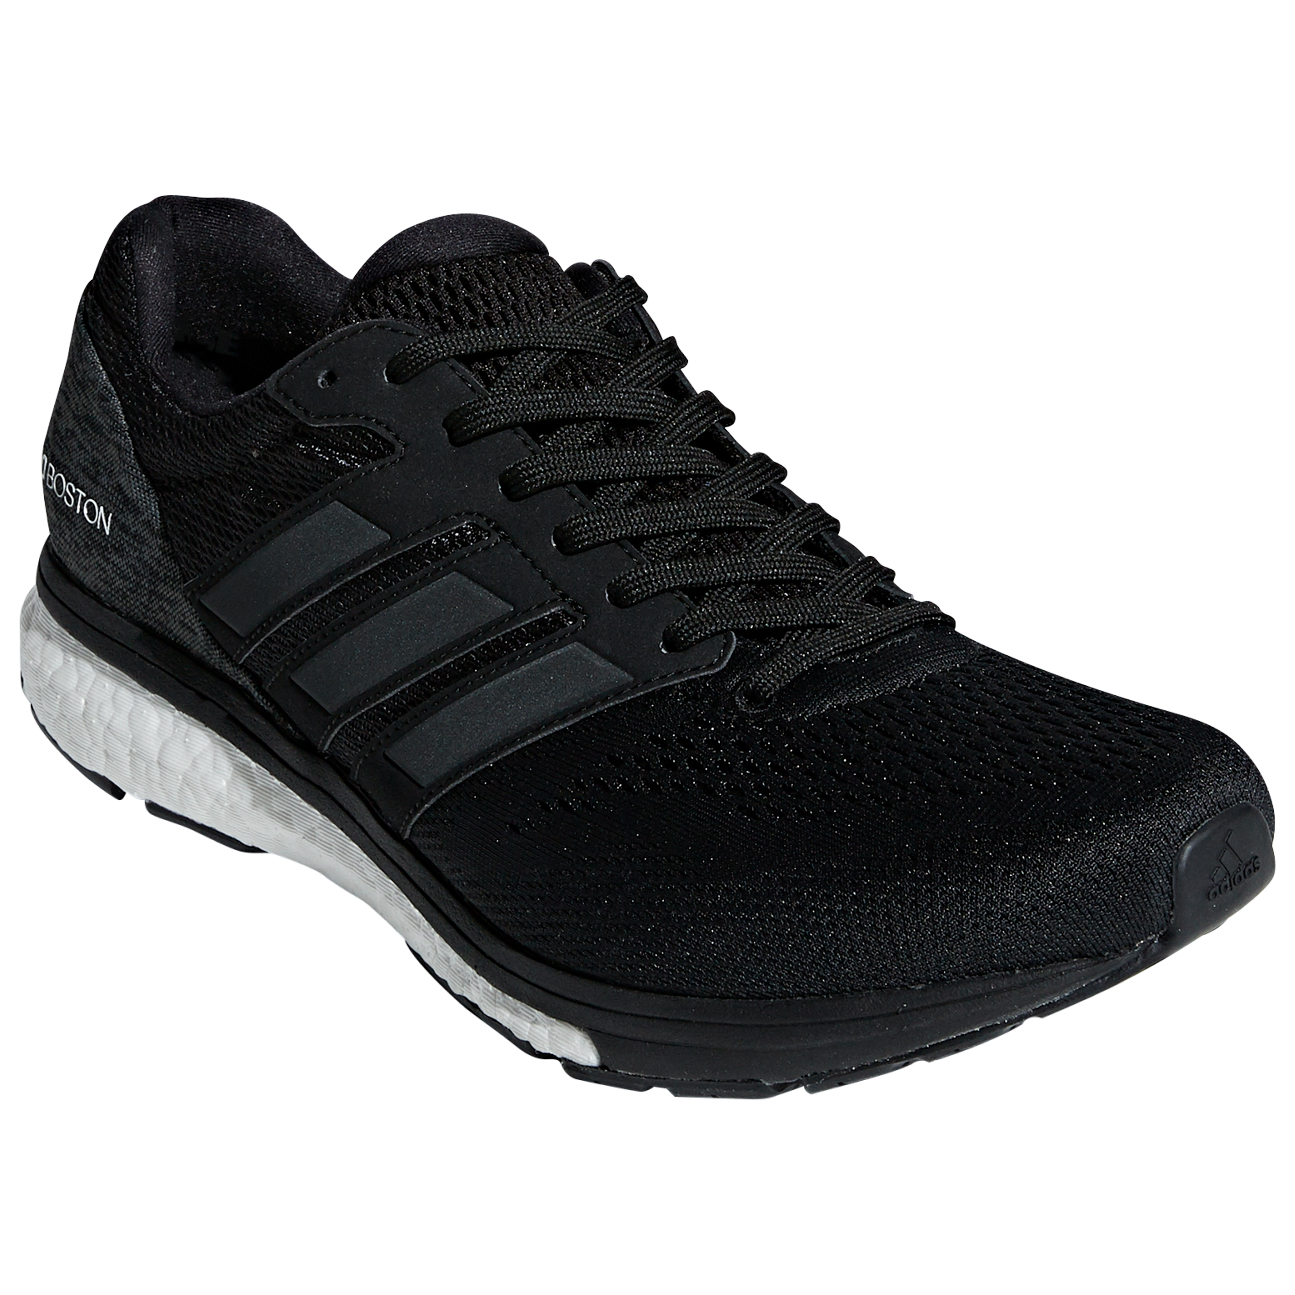 Adidas Adizero Boston 7 - Springskor Herr  9371bdc0132ee